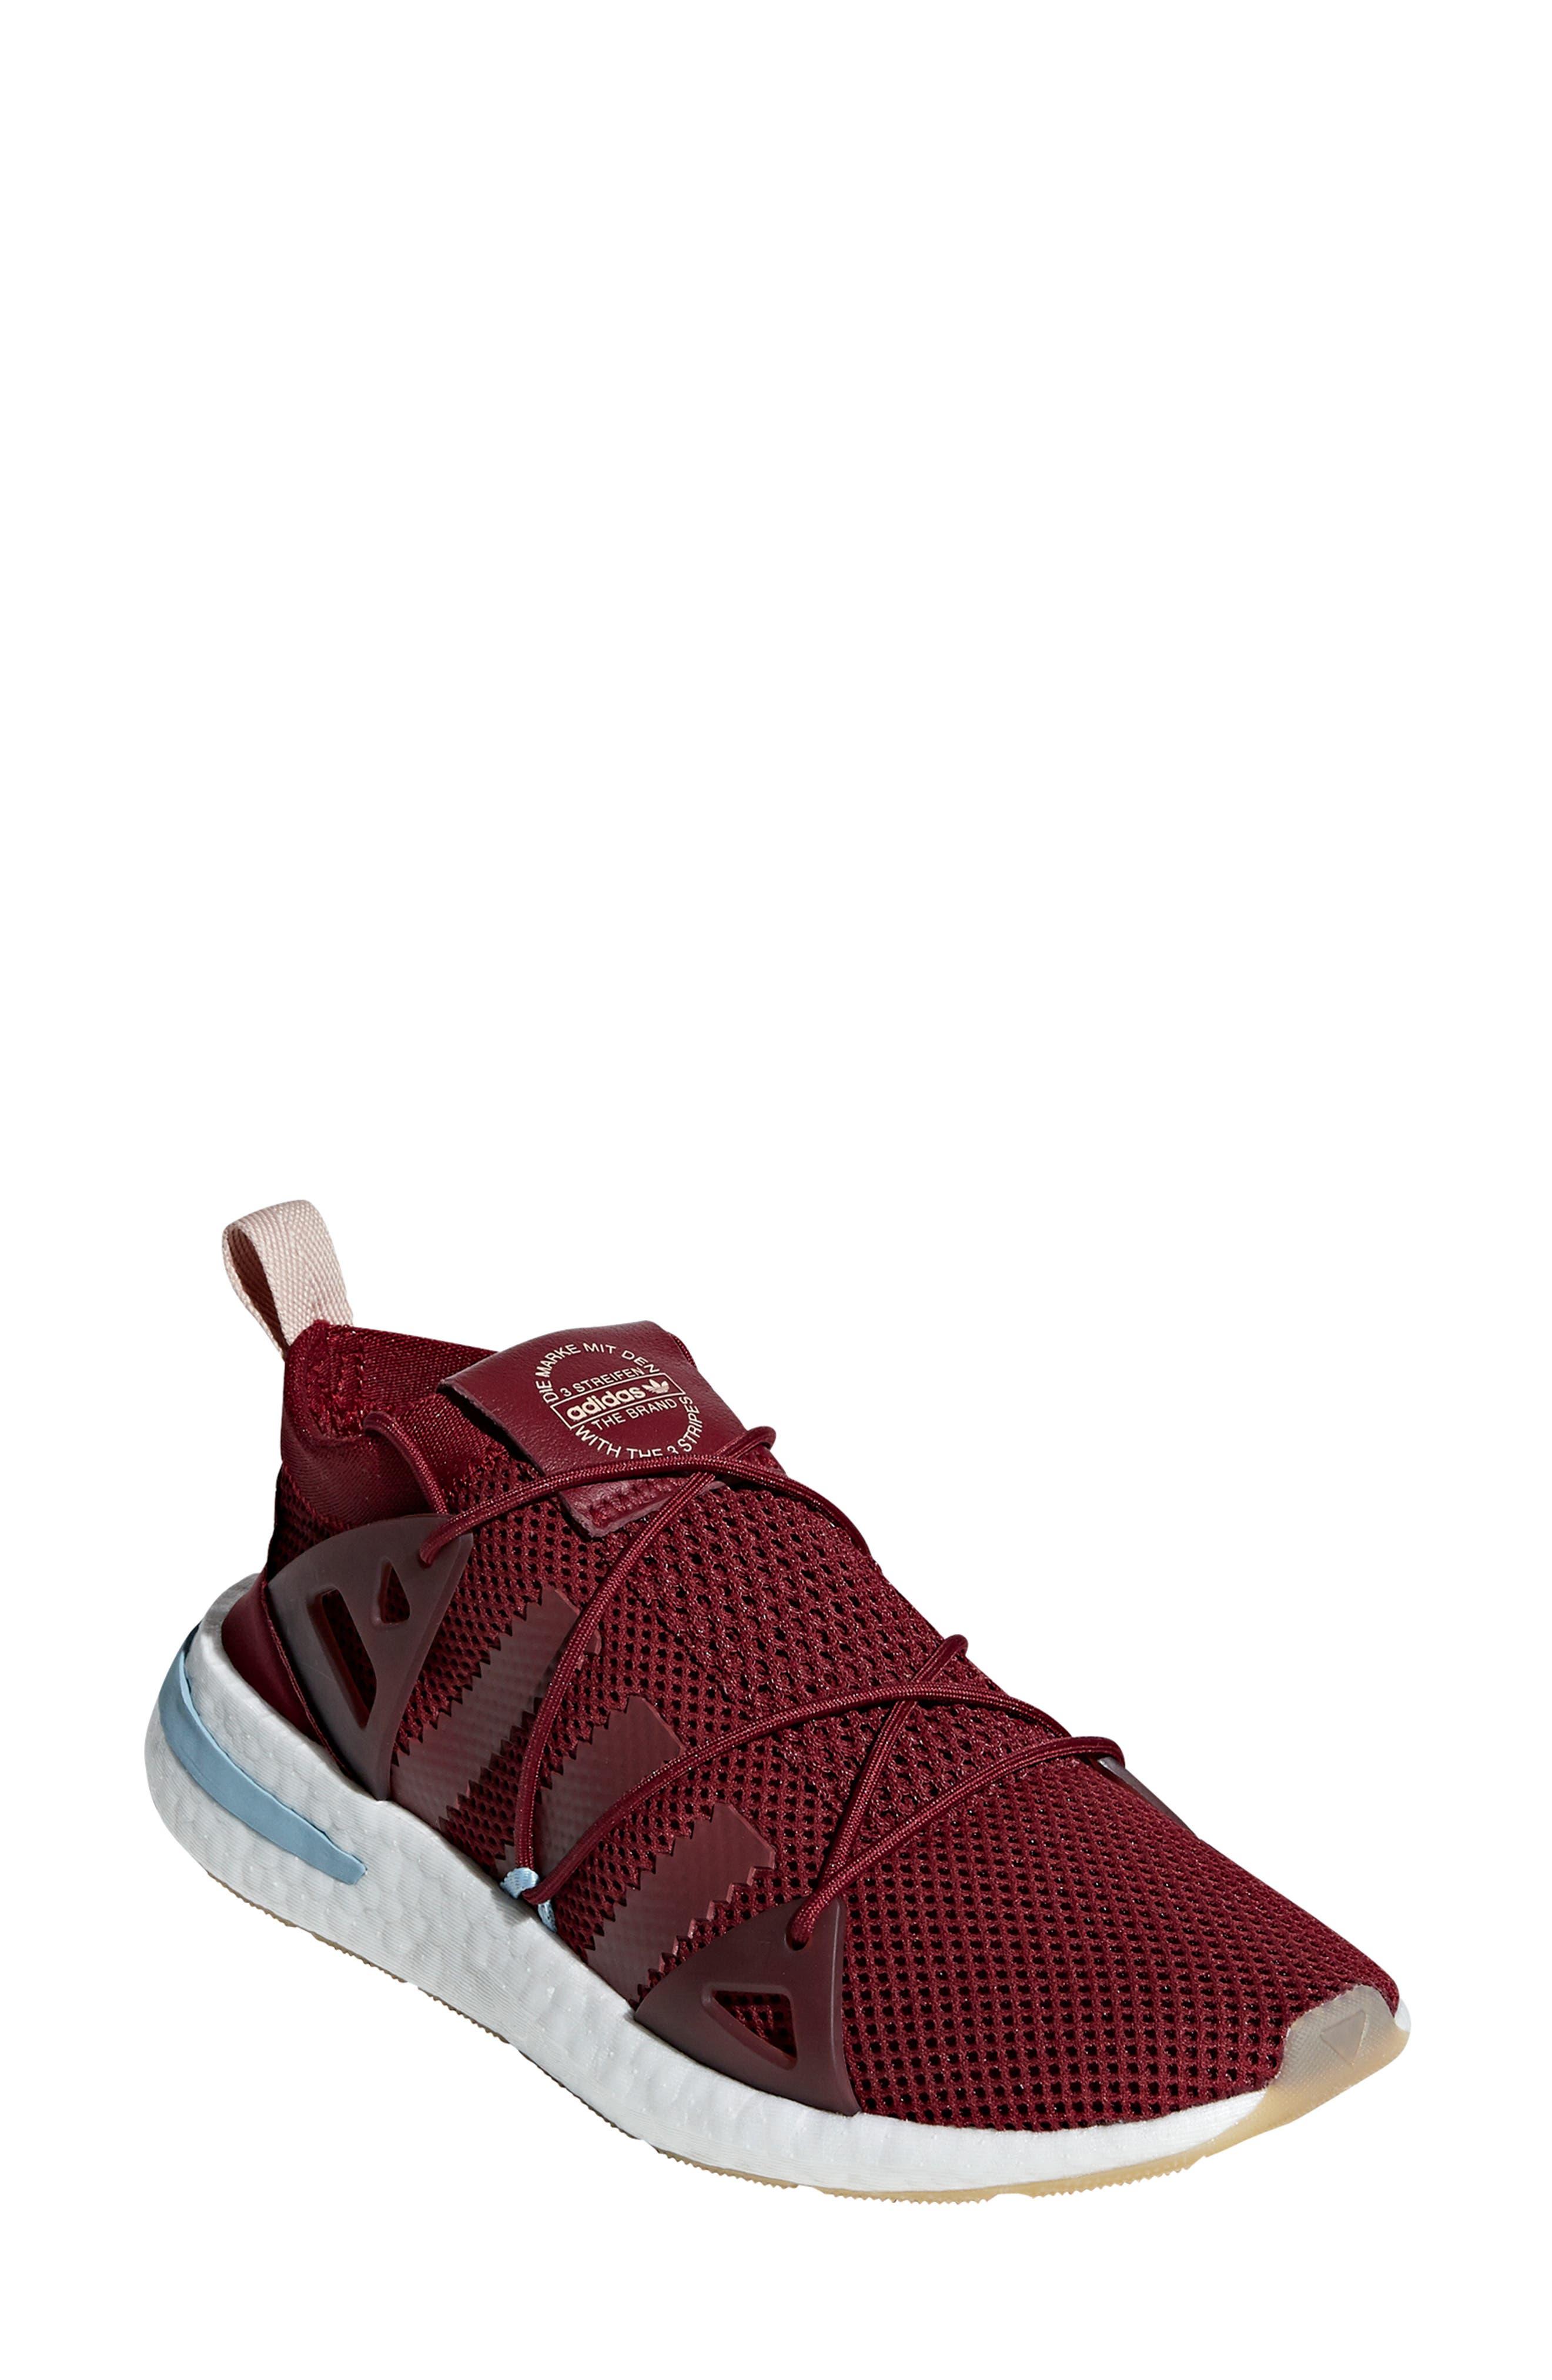 Adidas Arkyn Sneaker, Burgundy